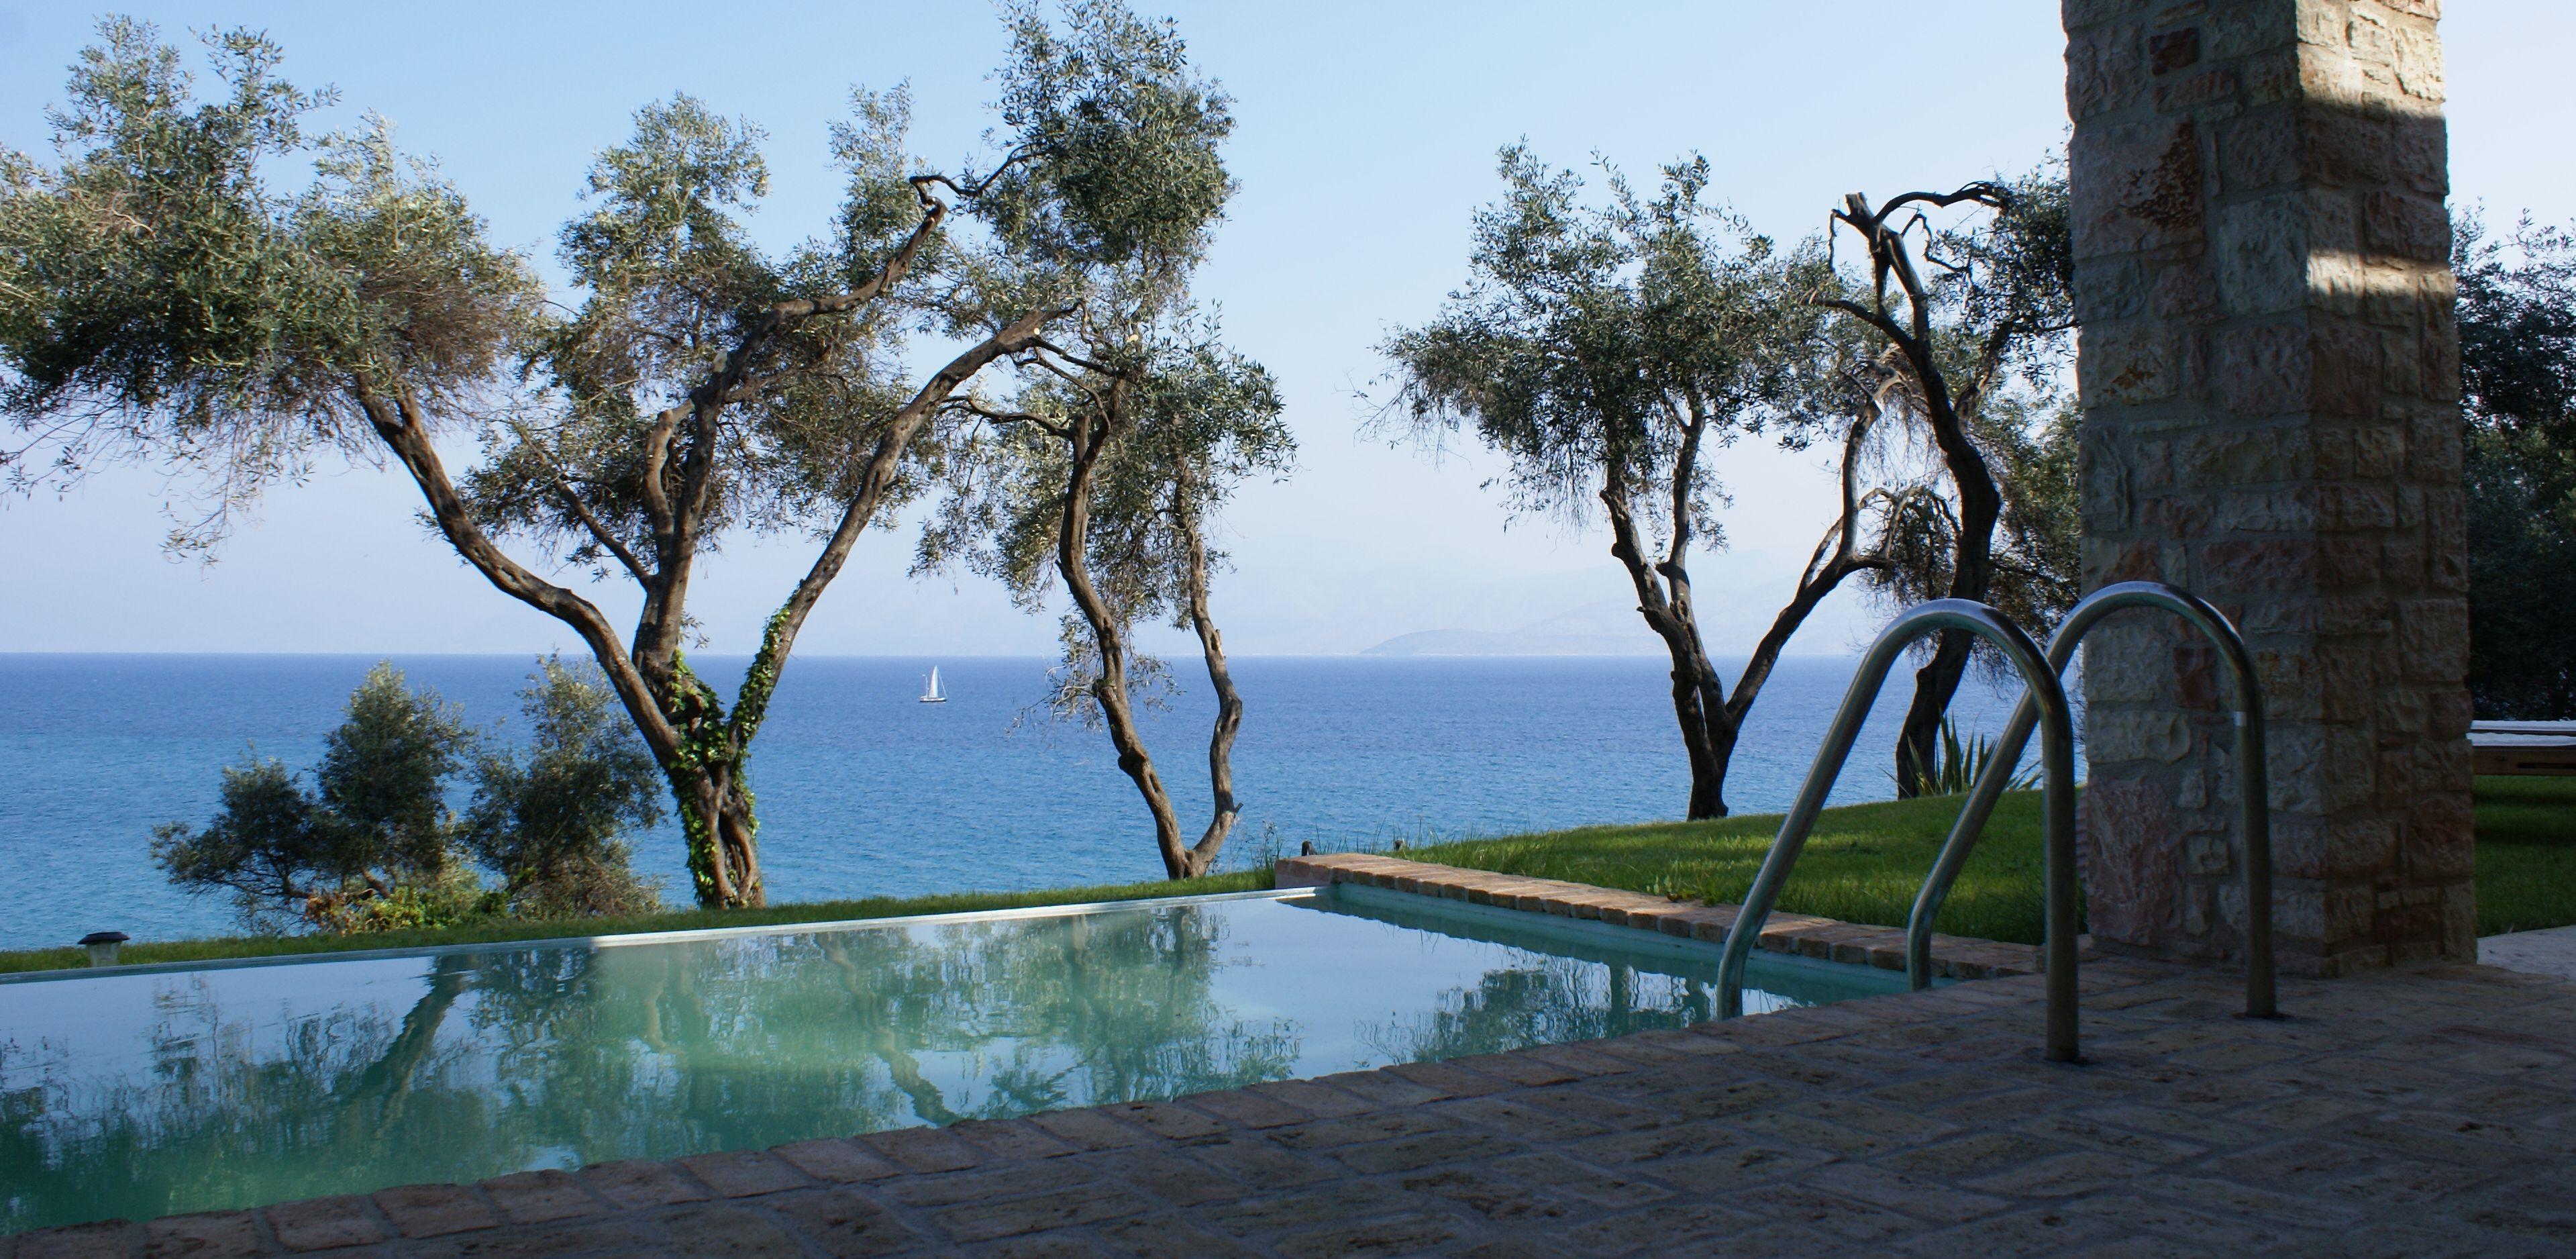 Meerblick - Korfu Villa Steilküste, Agios Spiridon, Korfu, Griechenland